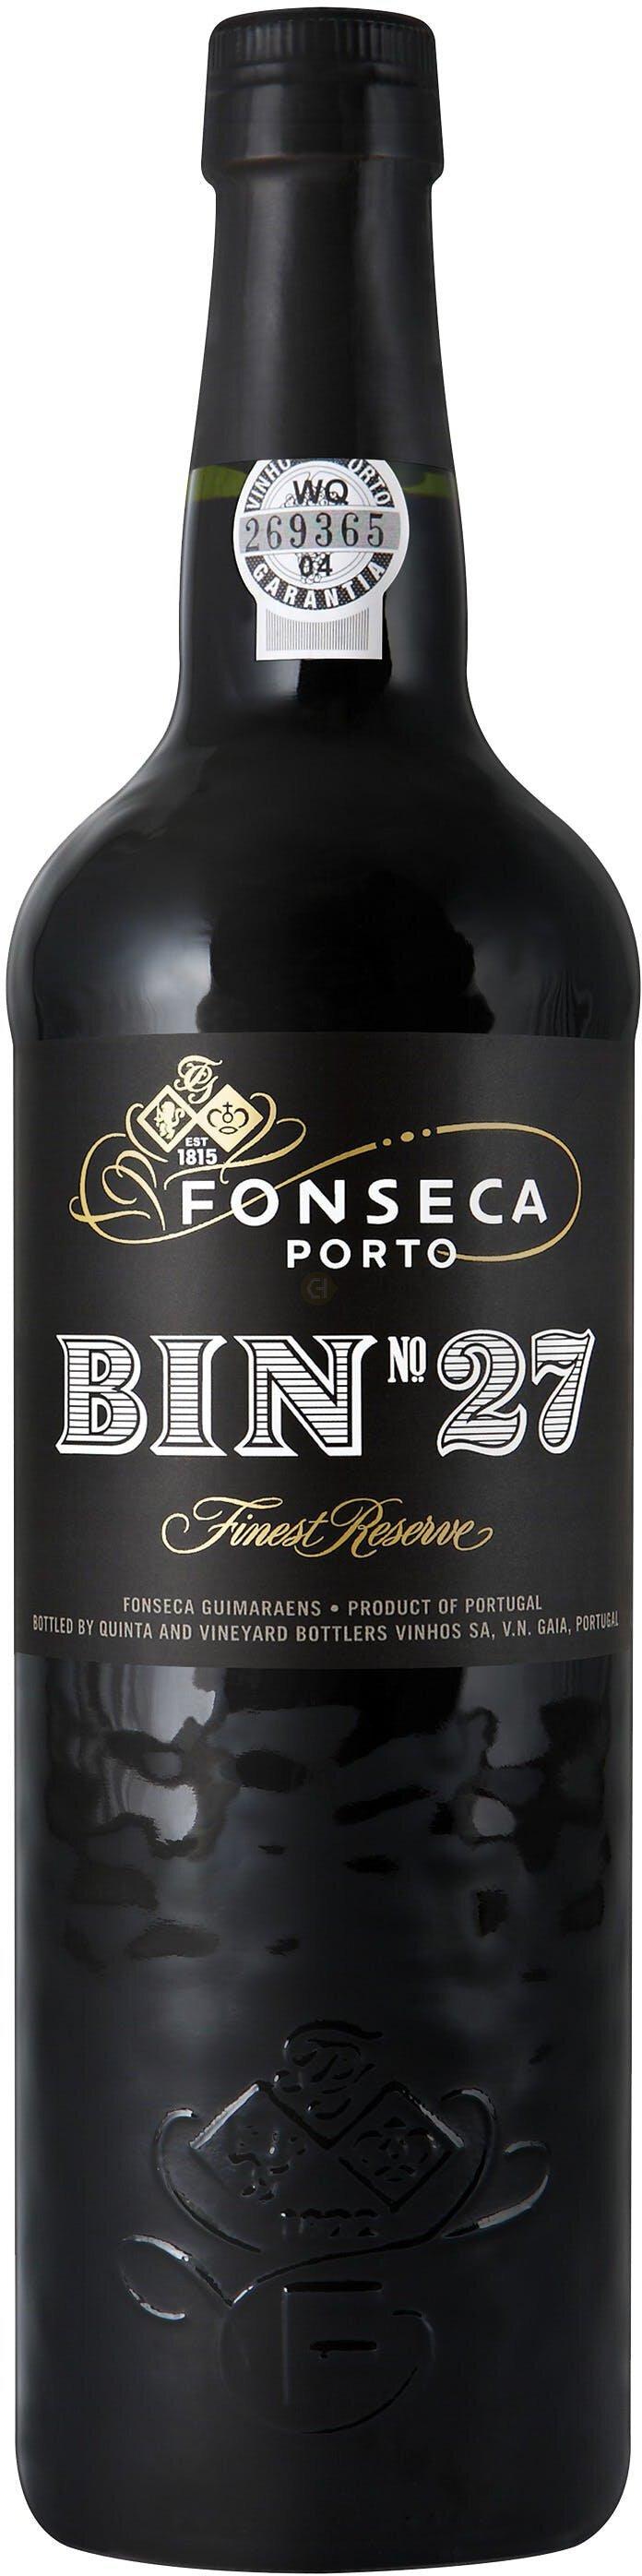 Fonseca Bin 27 Reserve Port